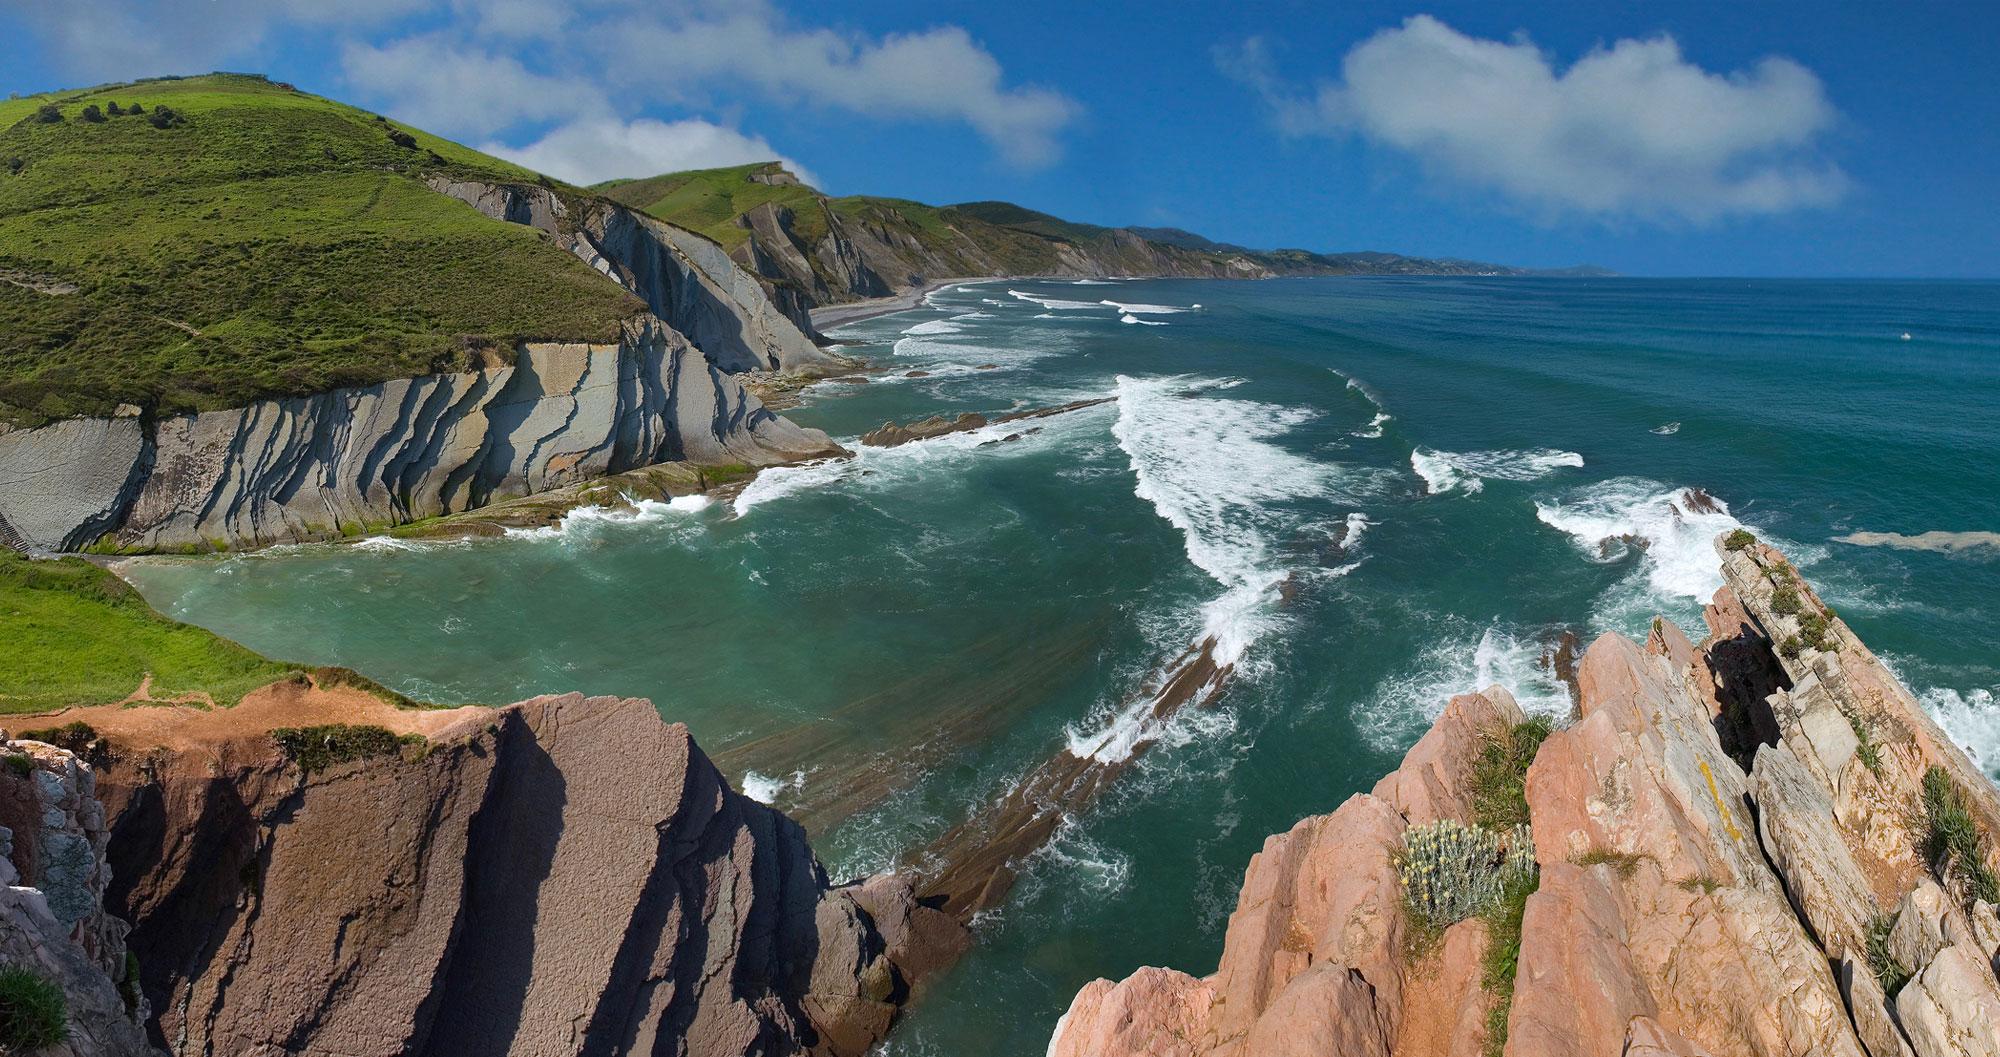 Cretaceous/ Paleogene boundary of Algorri